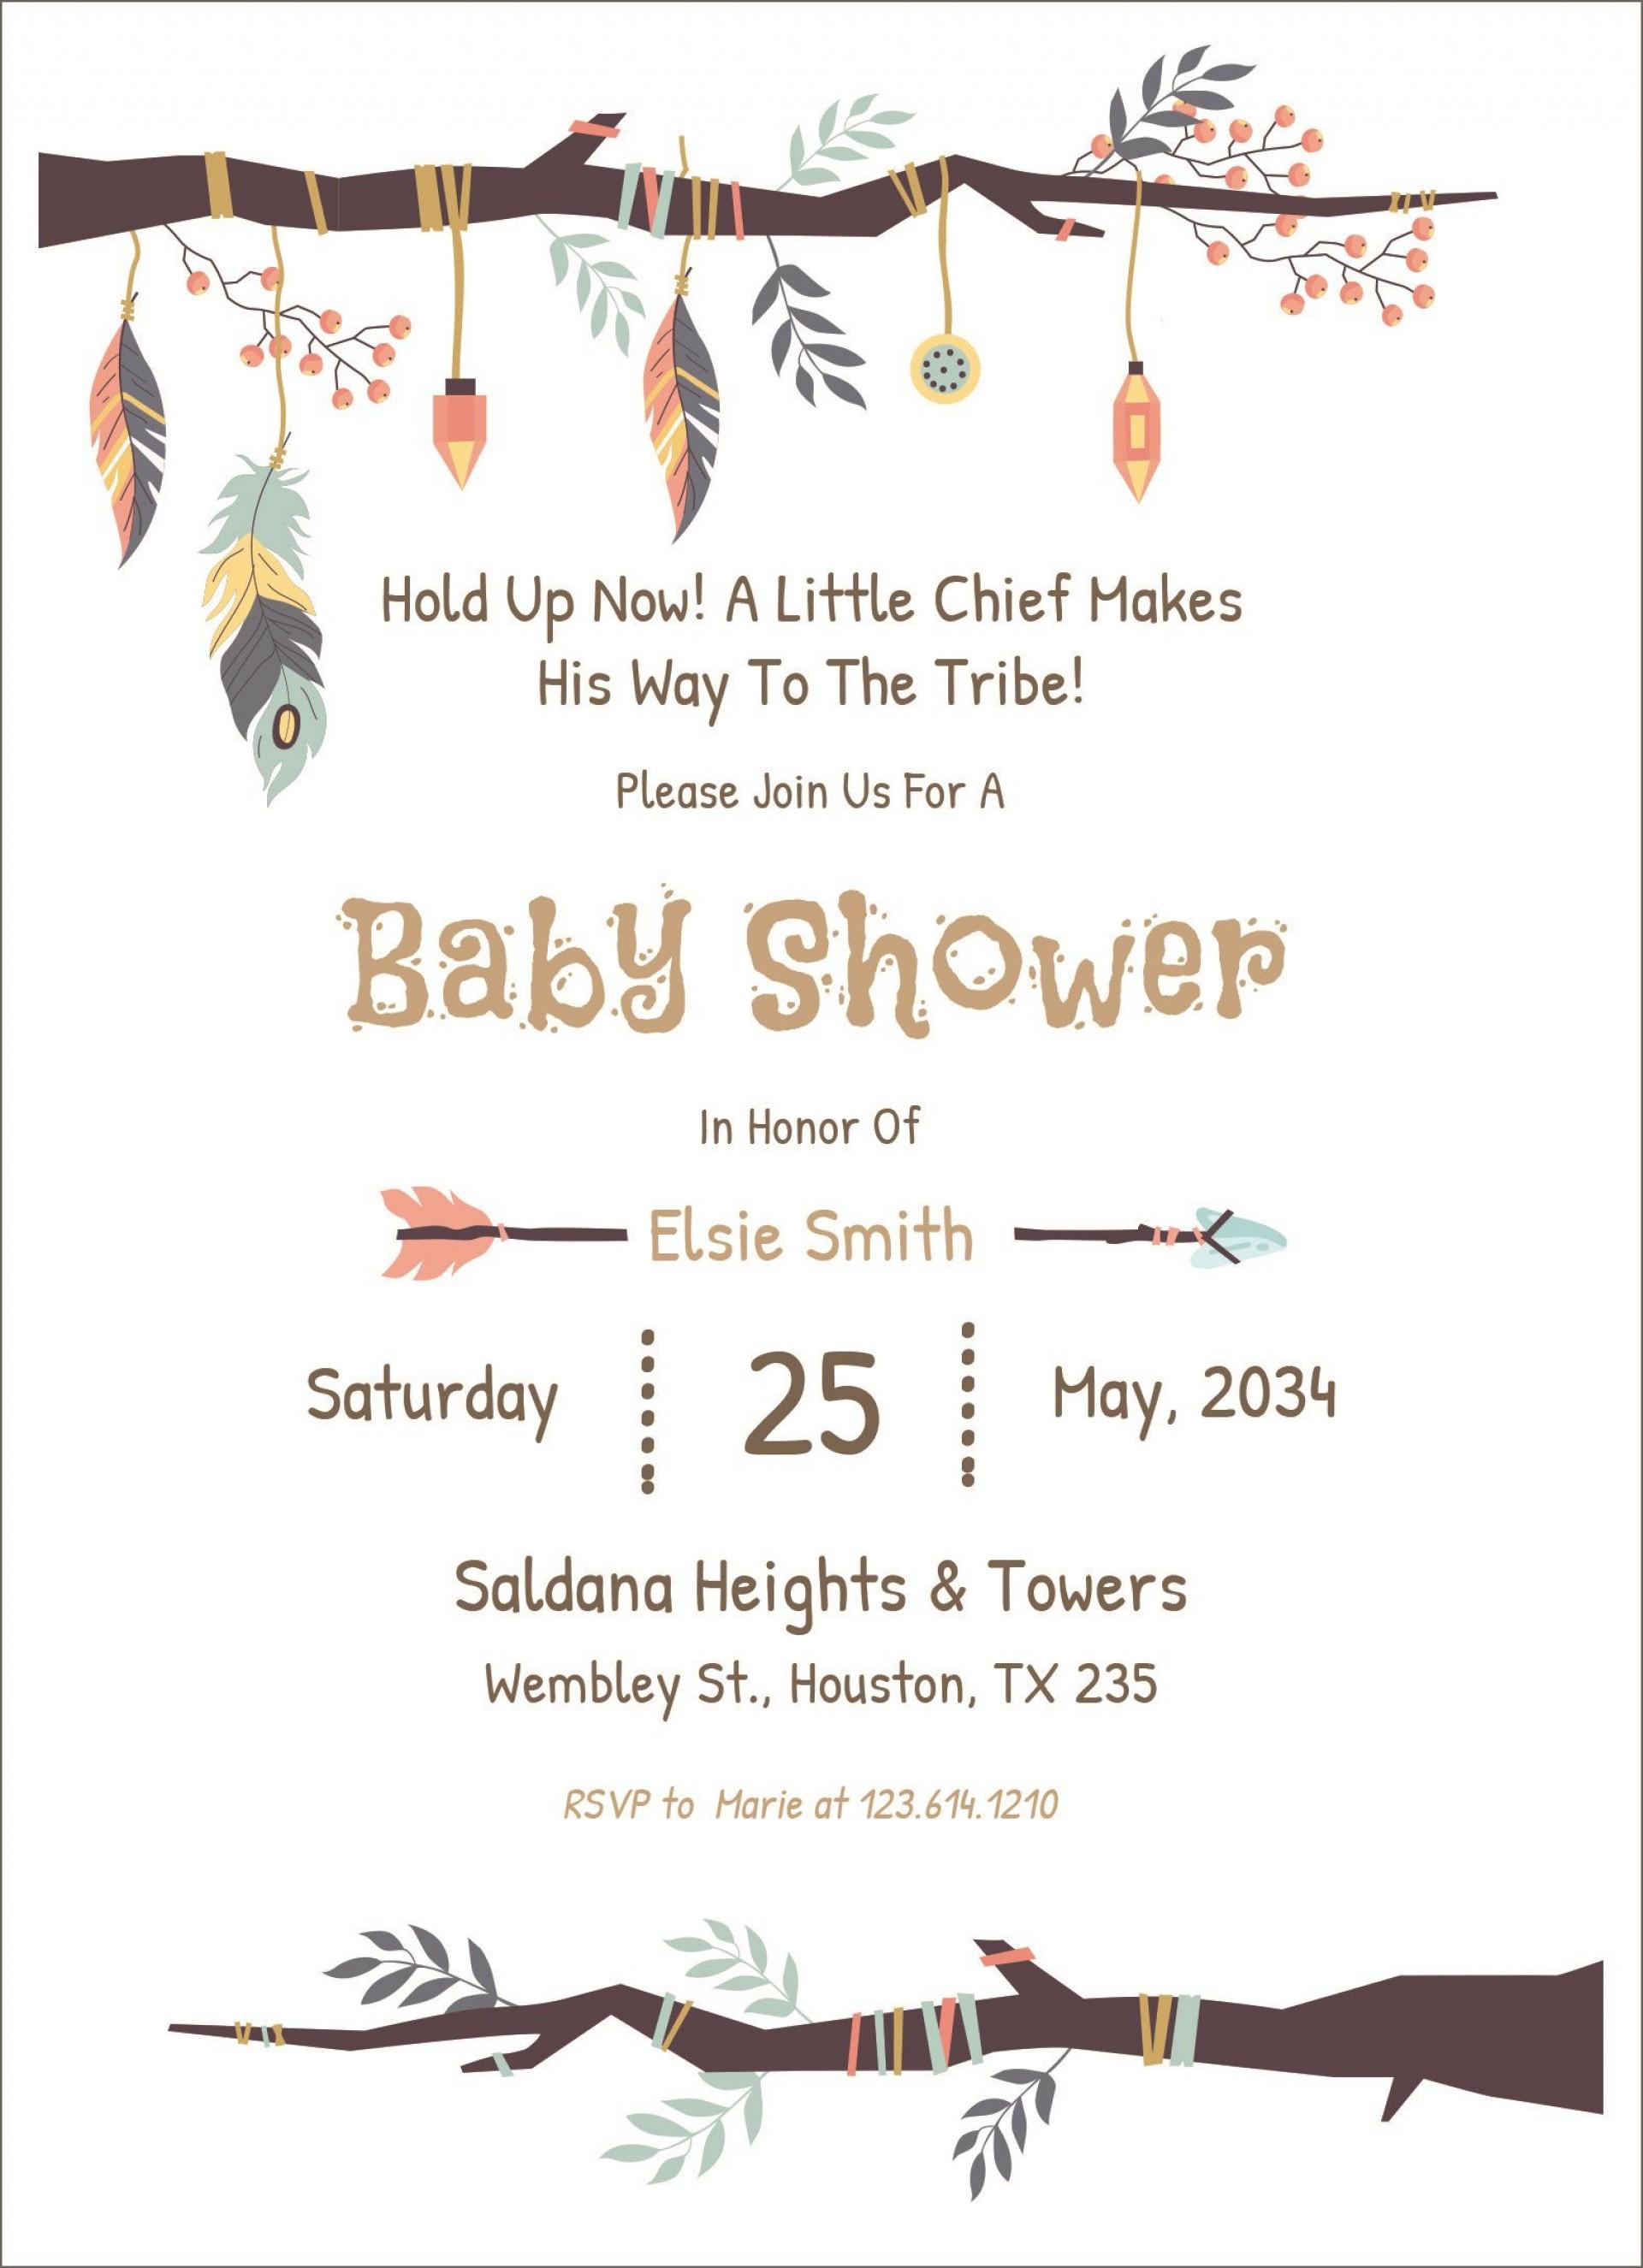 003 Formidable Free Baby Shower Invitation Template Editable High Def  Digital Microsoft Word1920